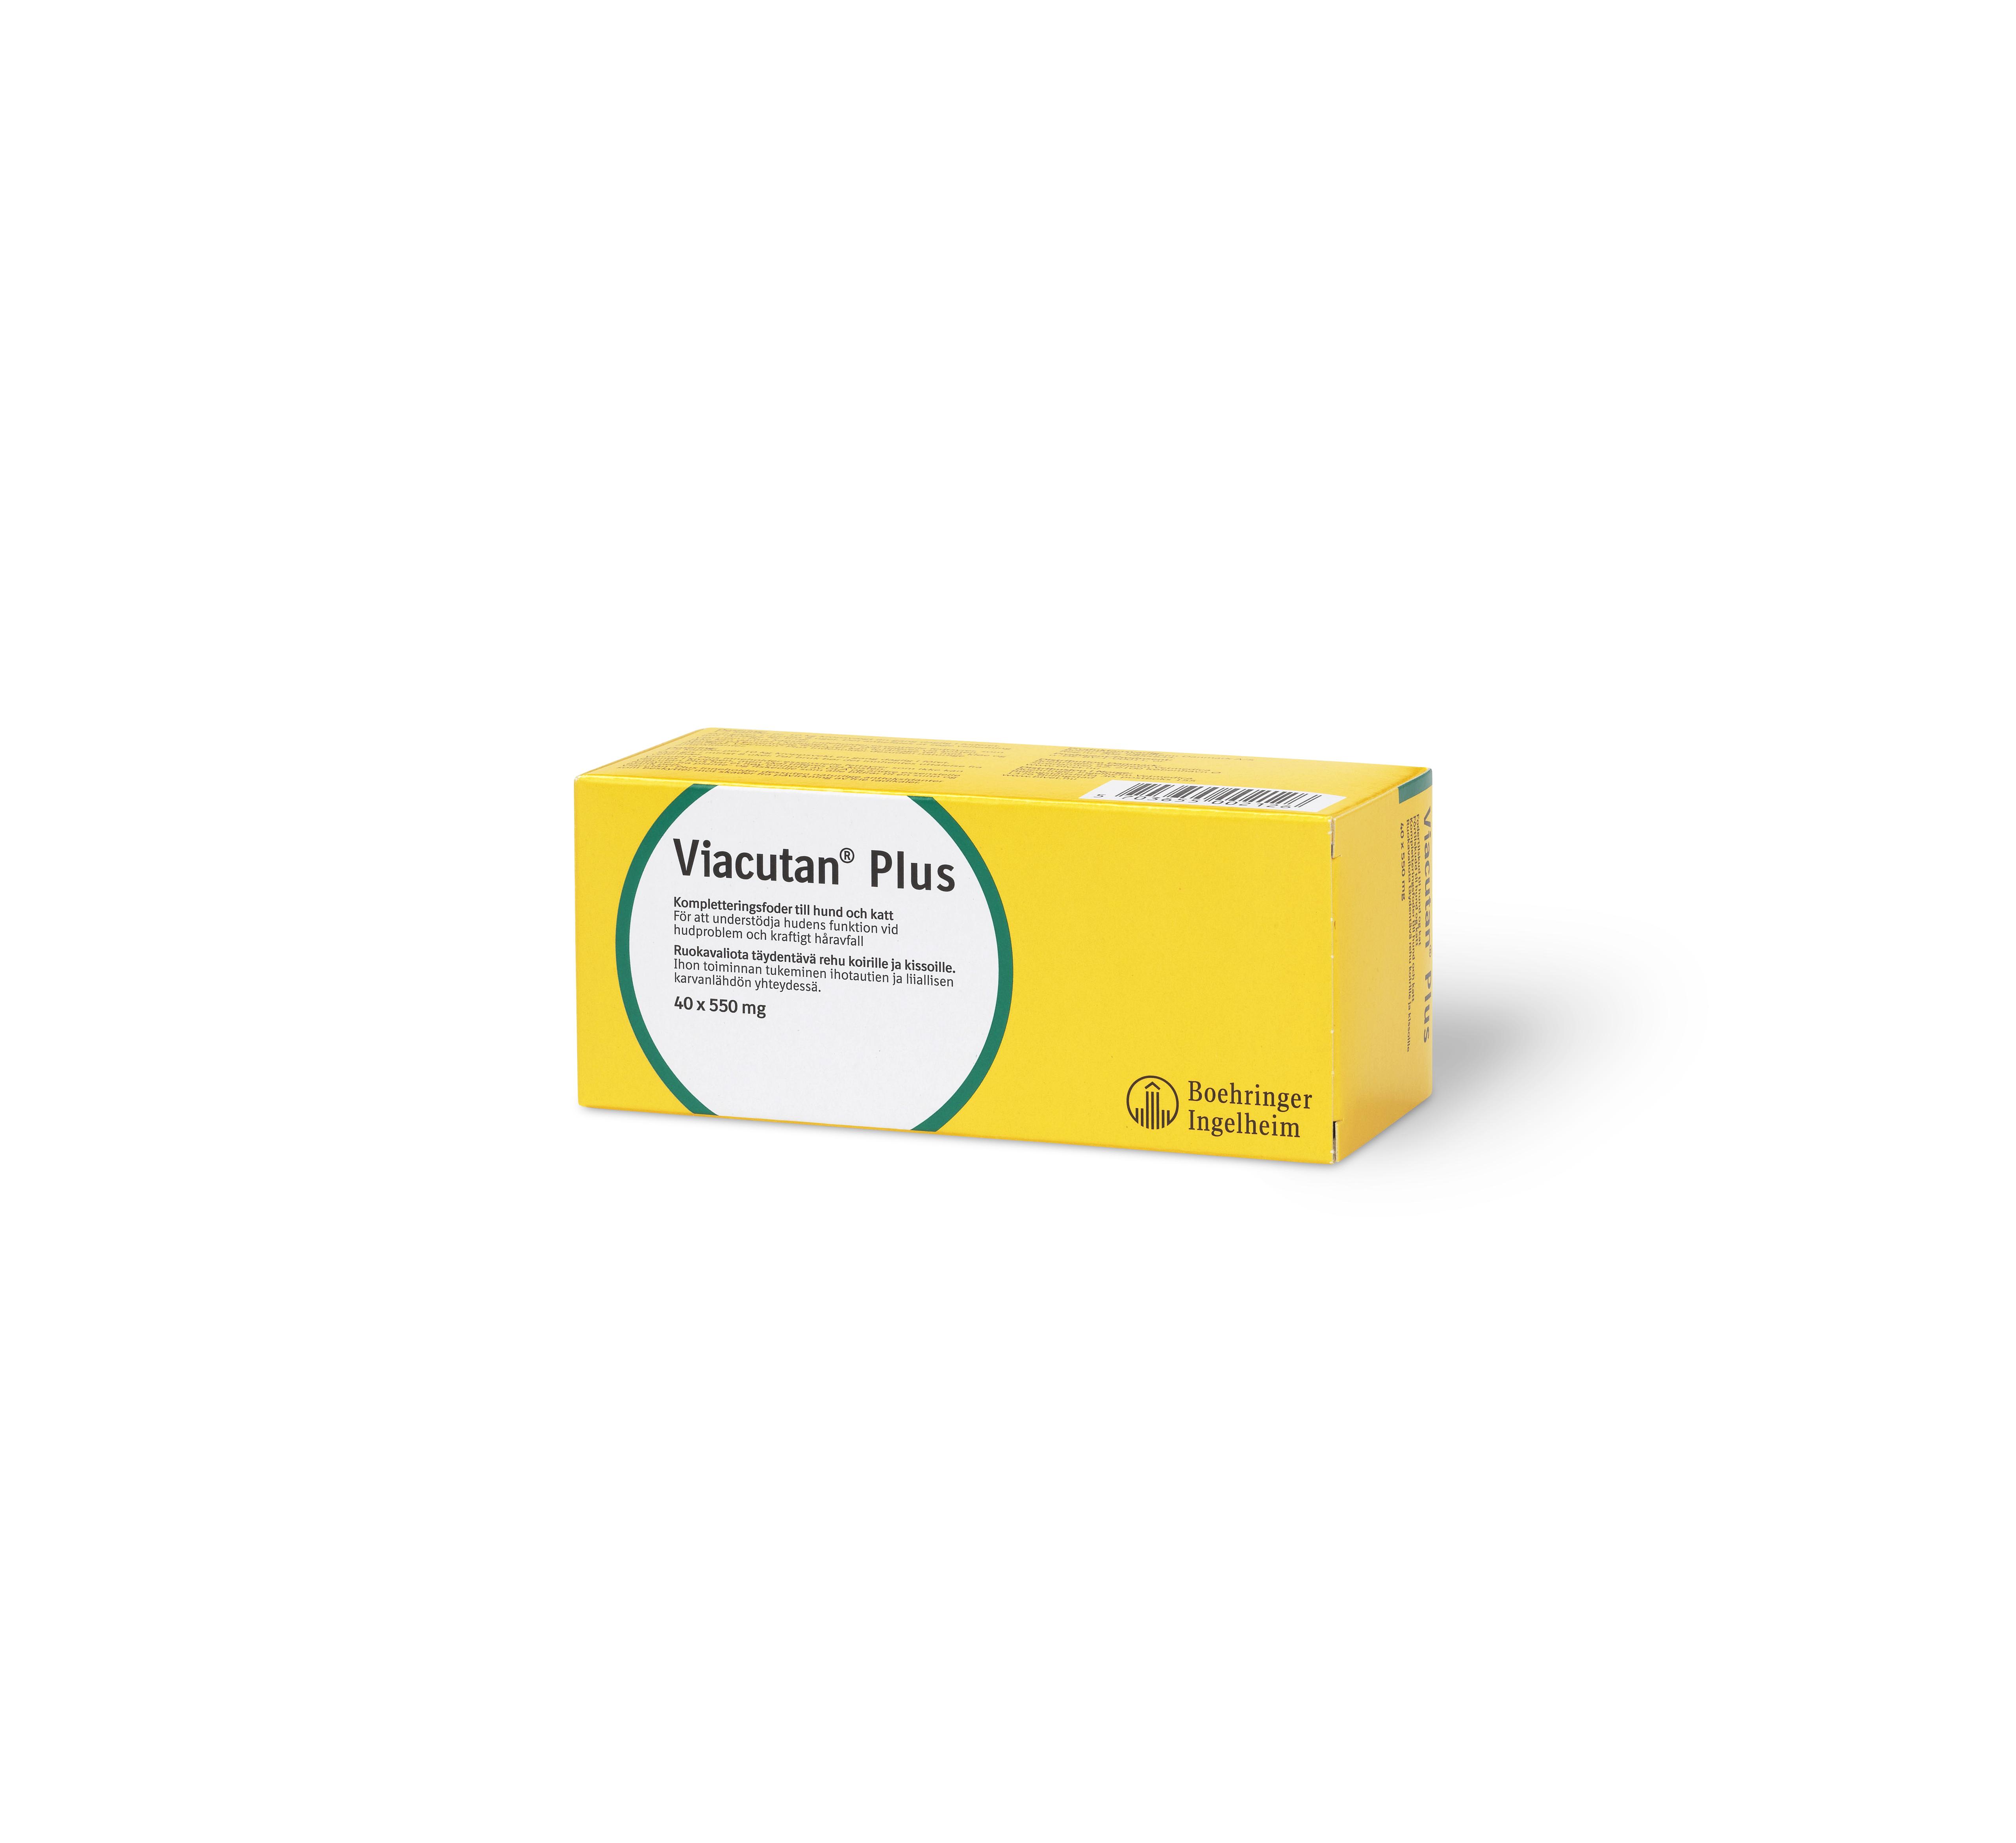 Viacutan Plus Kapslar - 40 kapslar x 550 mg